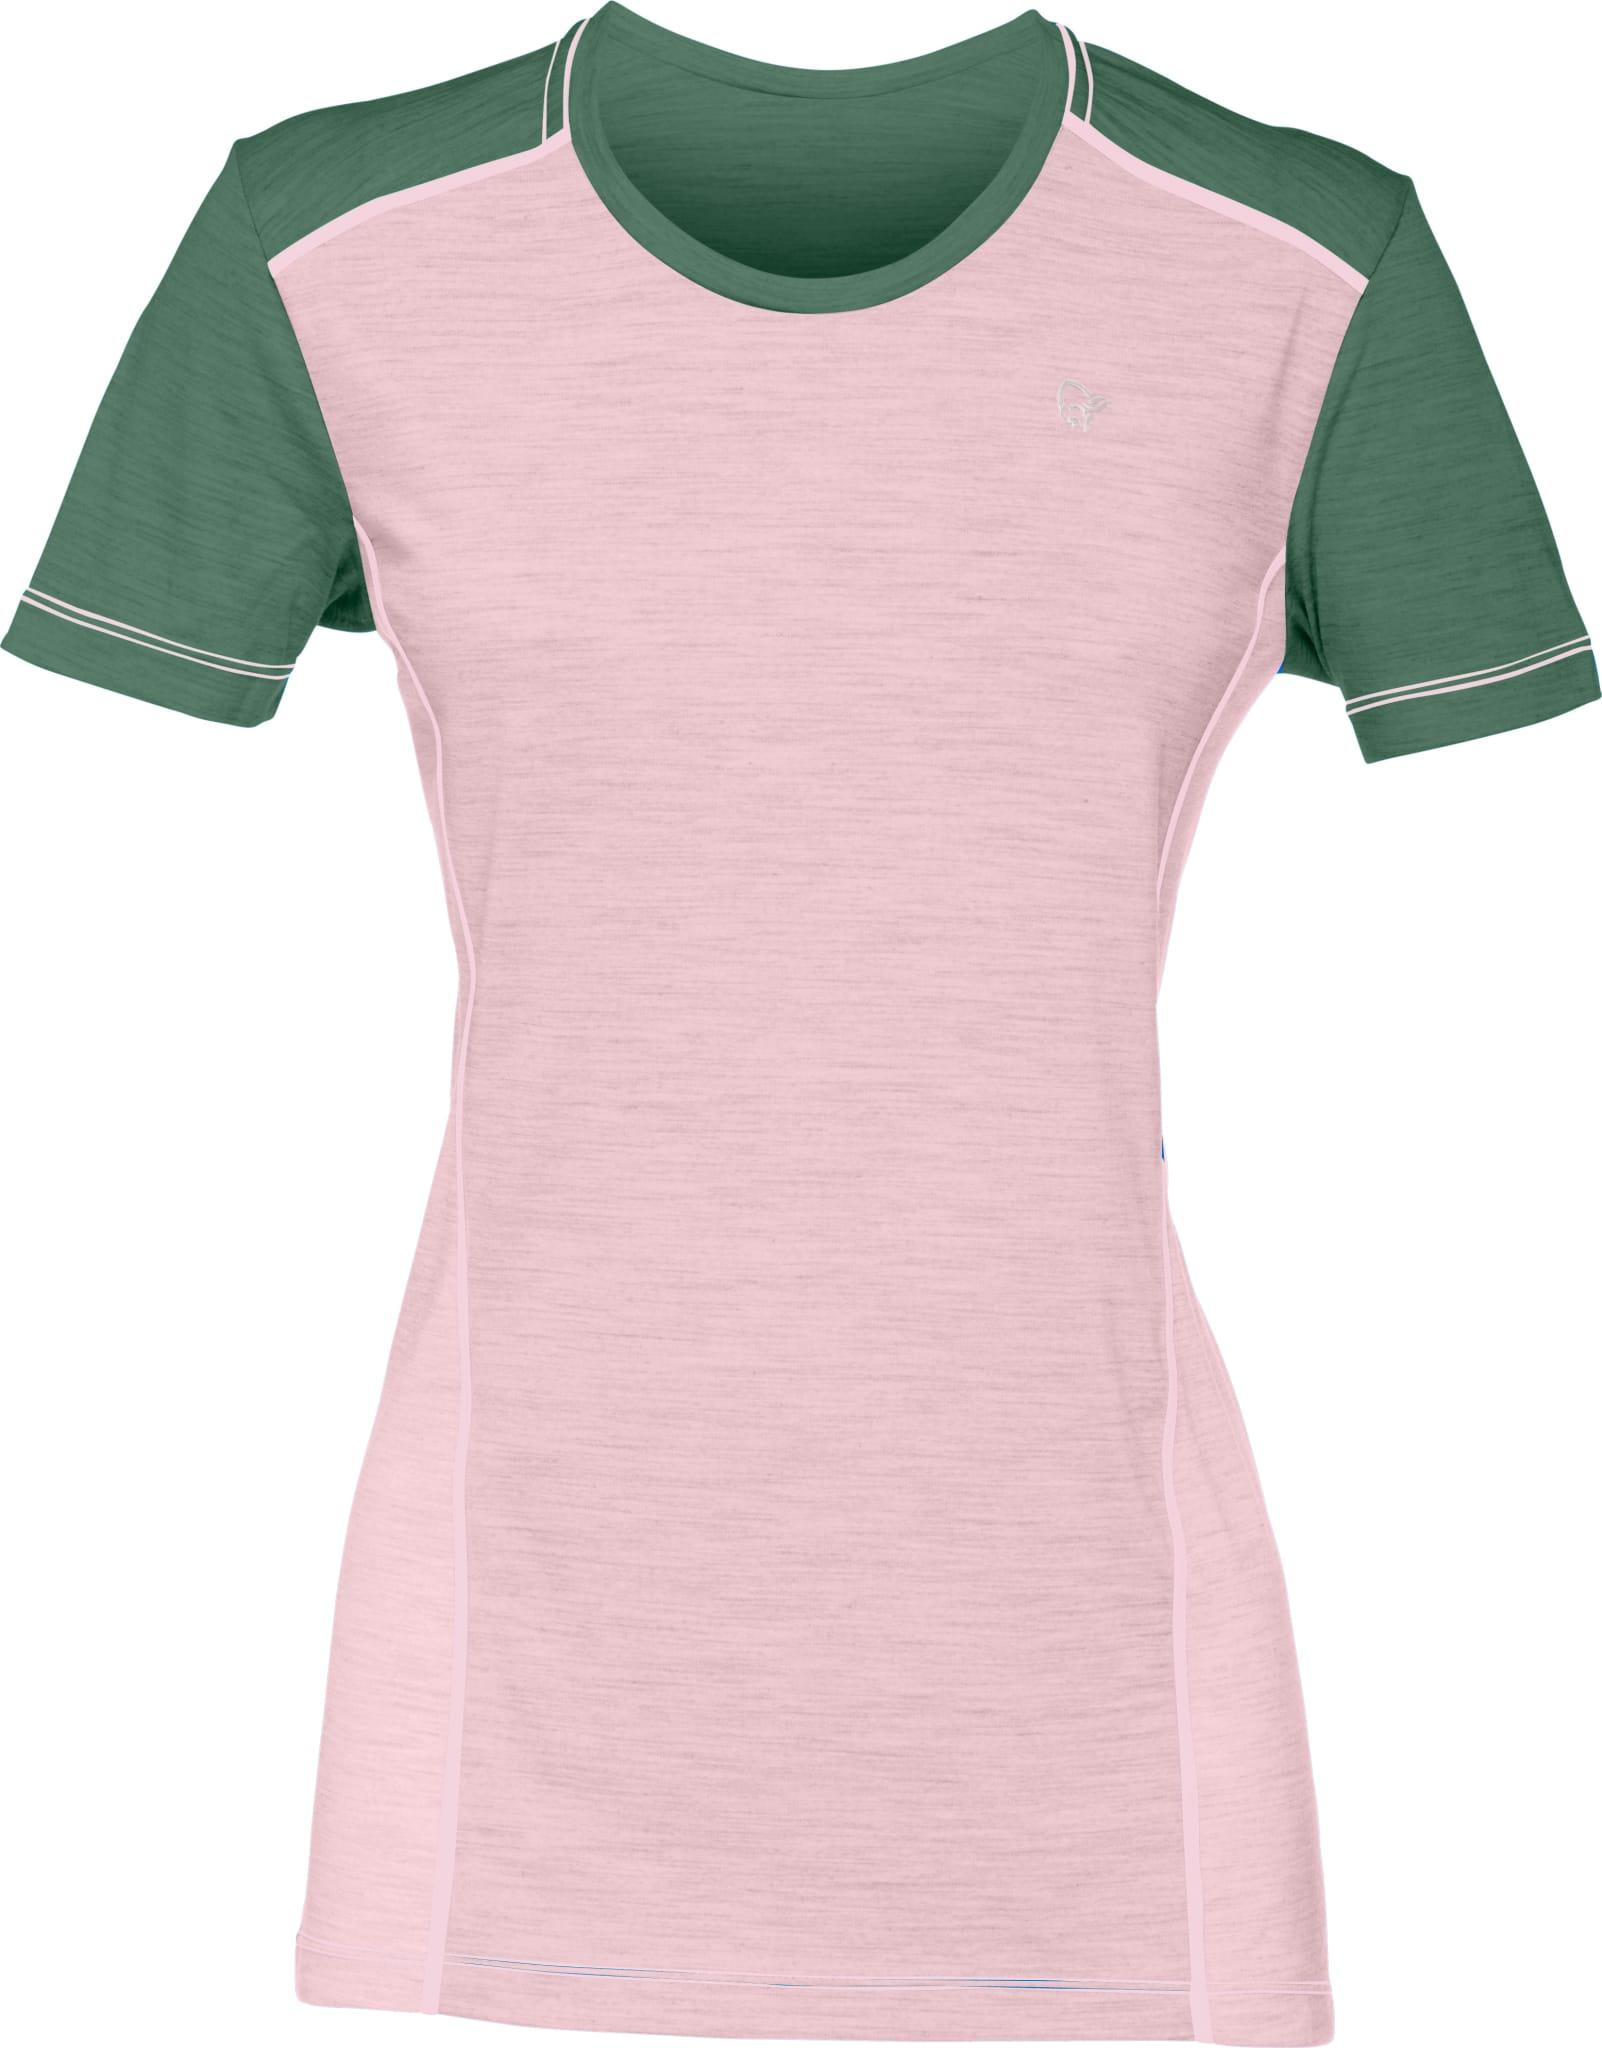 Helårs T-skjorte i silkemyk ull